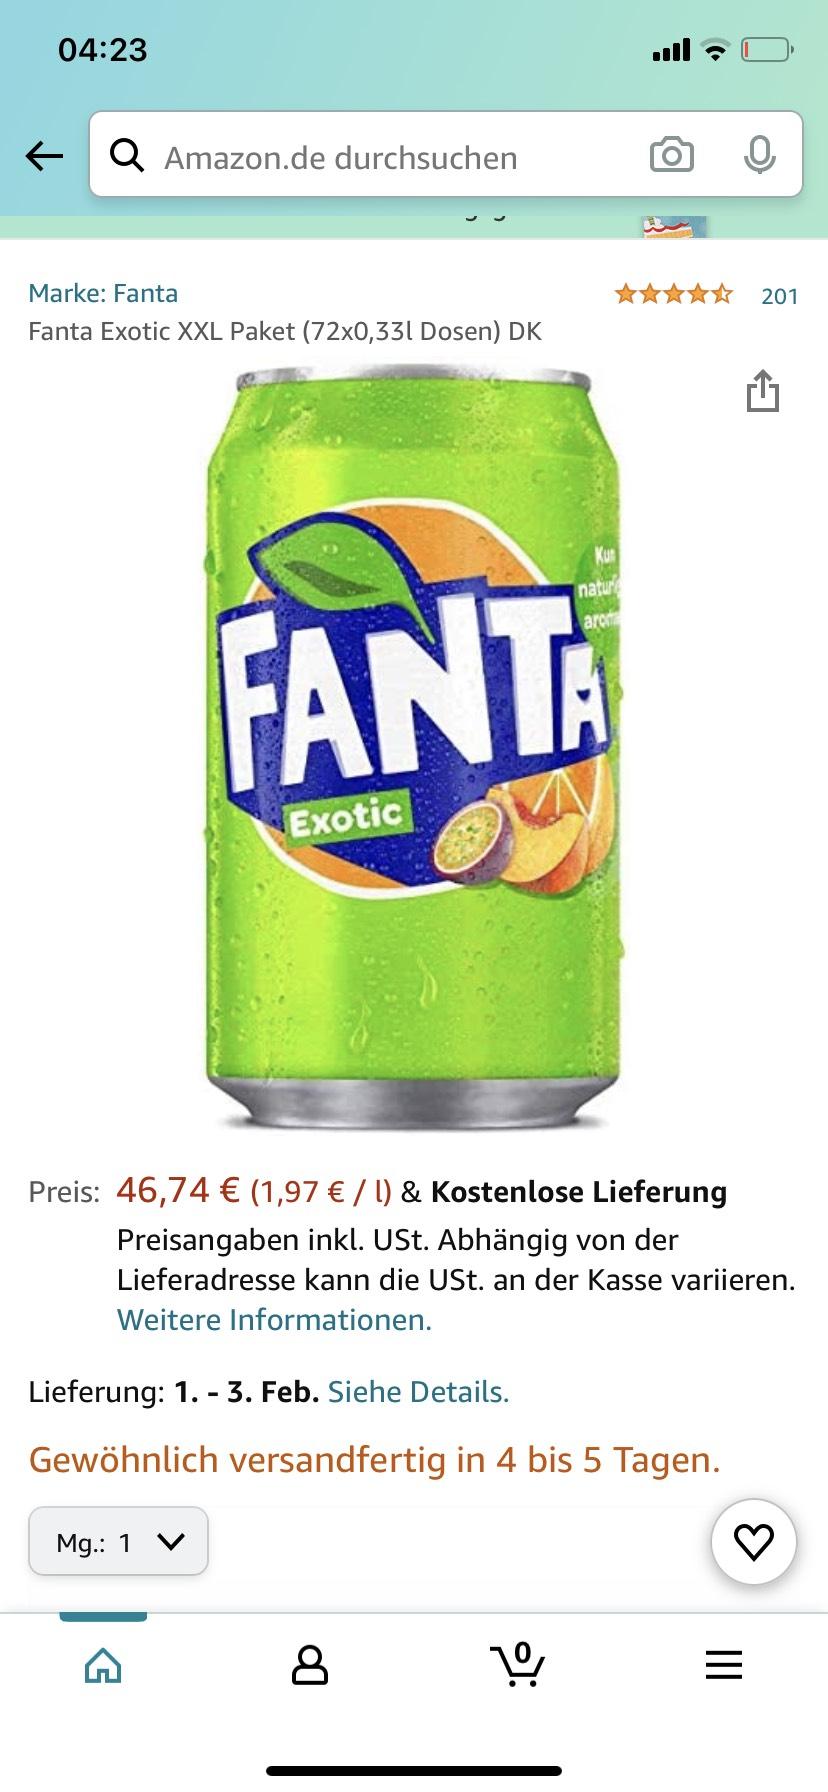 Fanta Exotic XXL Paket (72x0,33l Dosen) - 0,65€ pro Dose